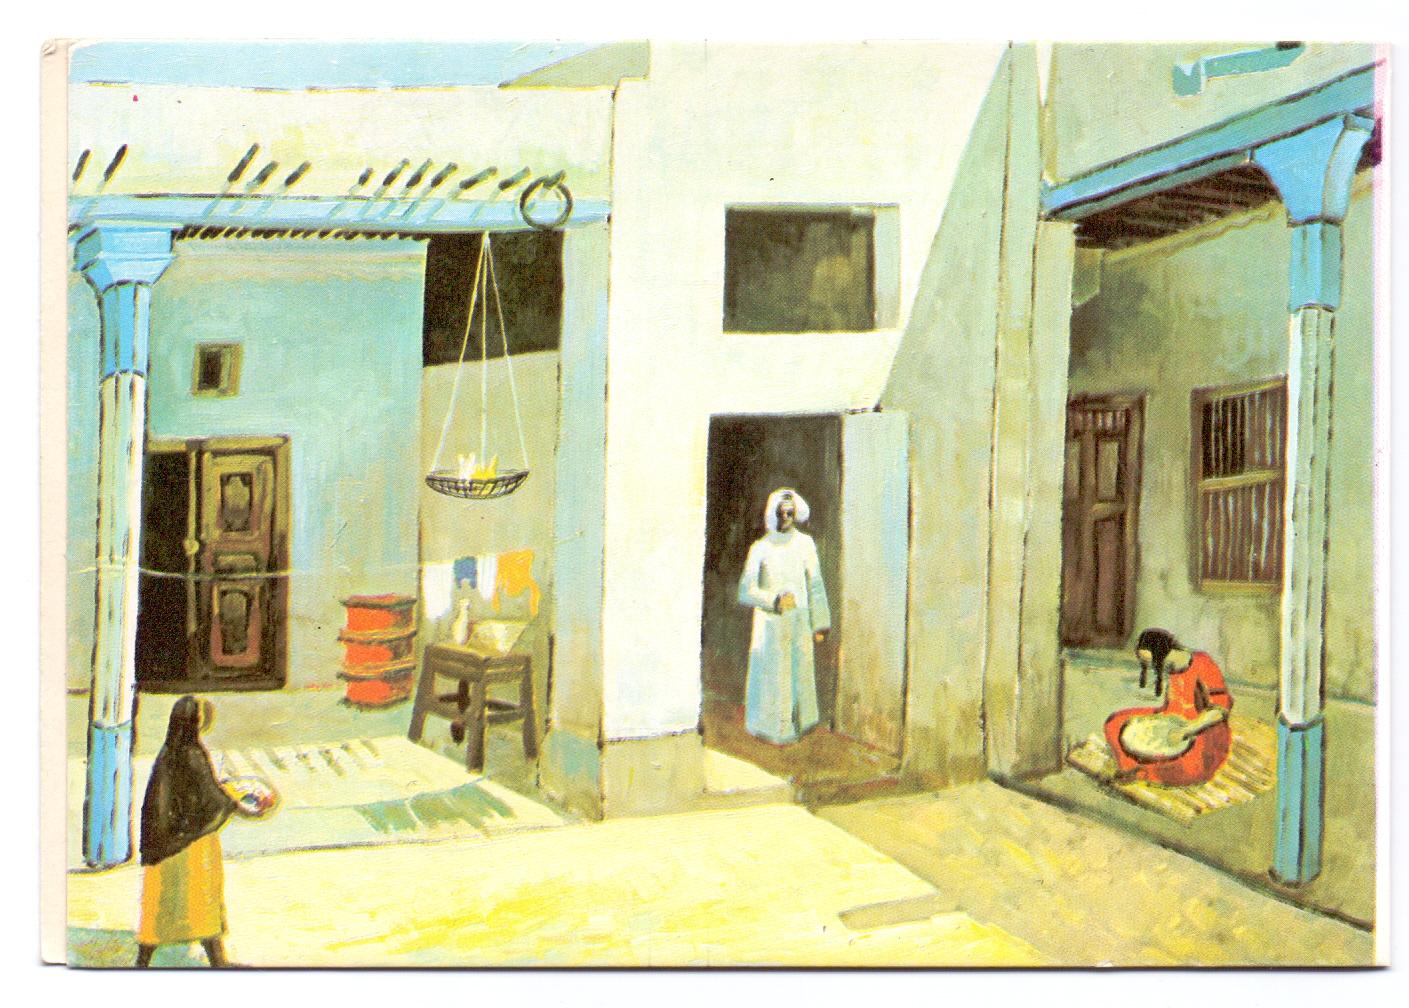 Eid AlFitr Greet card an old Kuwaiti House painting - KUWAIT PHILATELIC